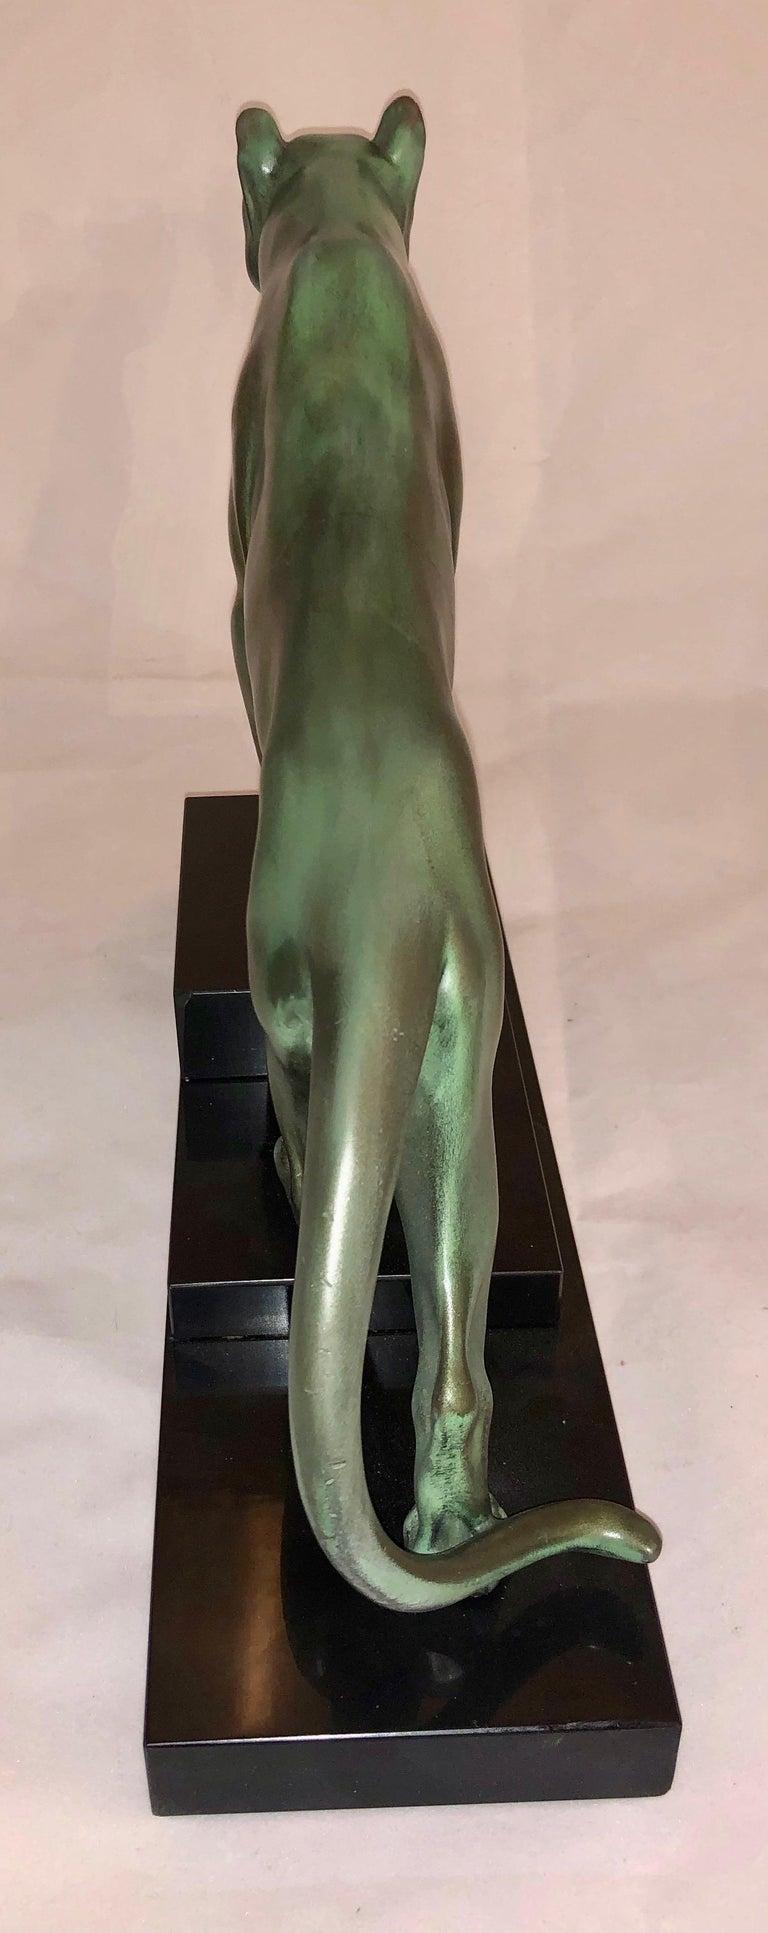 Max Le Verrier Art Deco Sculpture of a Panther, France, 1930 For Sale 5